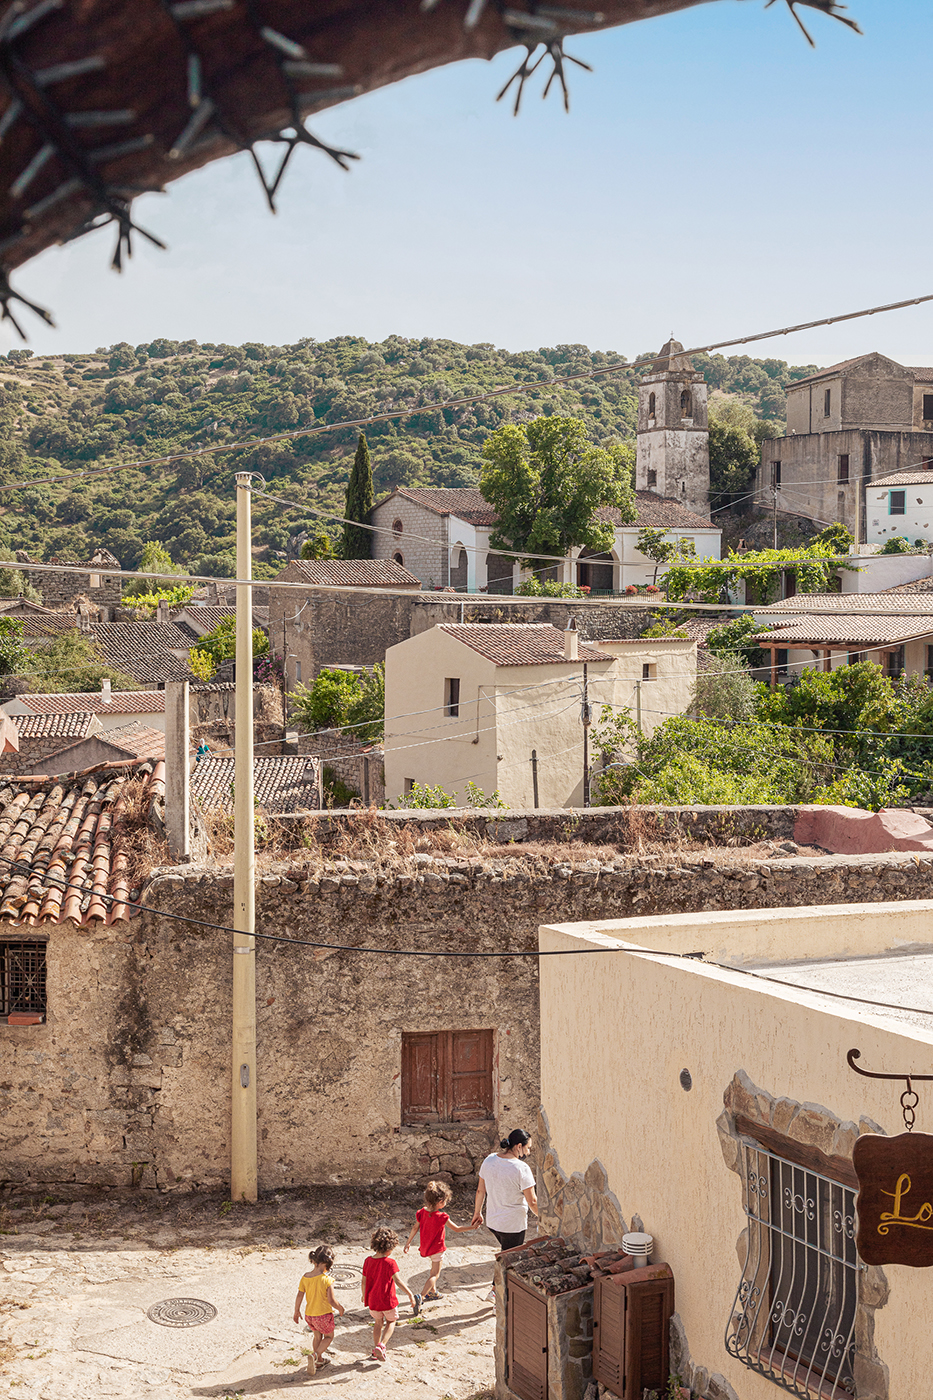 Medieval homes on the hill in Lovelle Sardinia shot by Alberto Bernasconi for Enjoy magazine